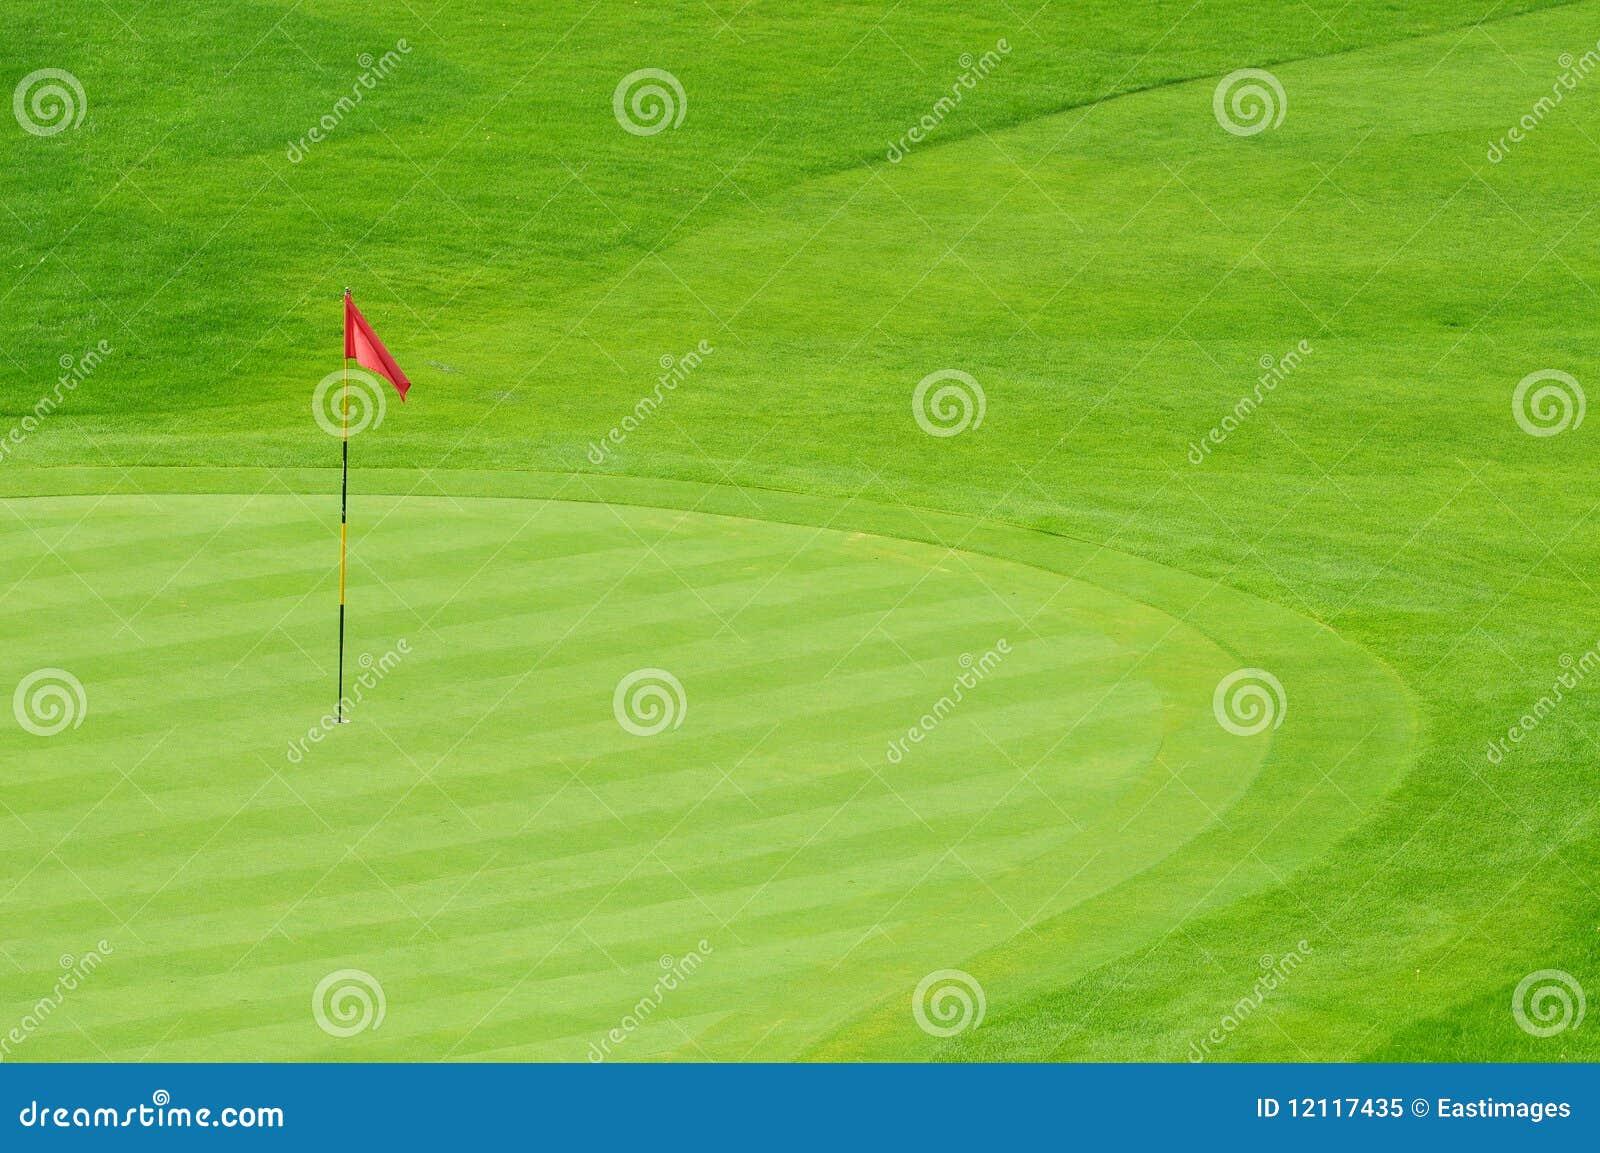 Golf Green Royalty Free Stock Photo Image 12117435